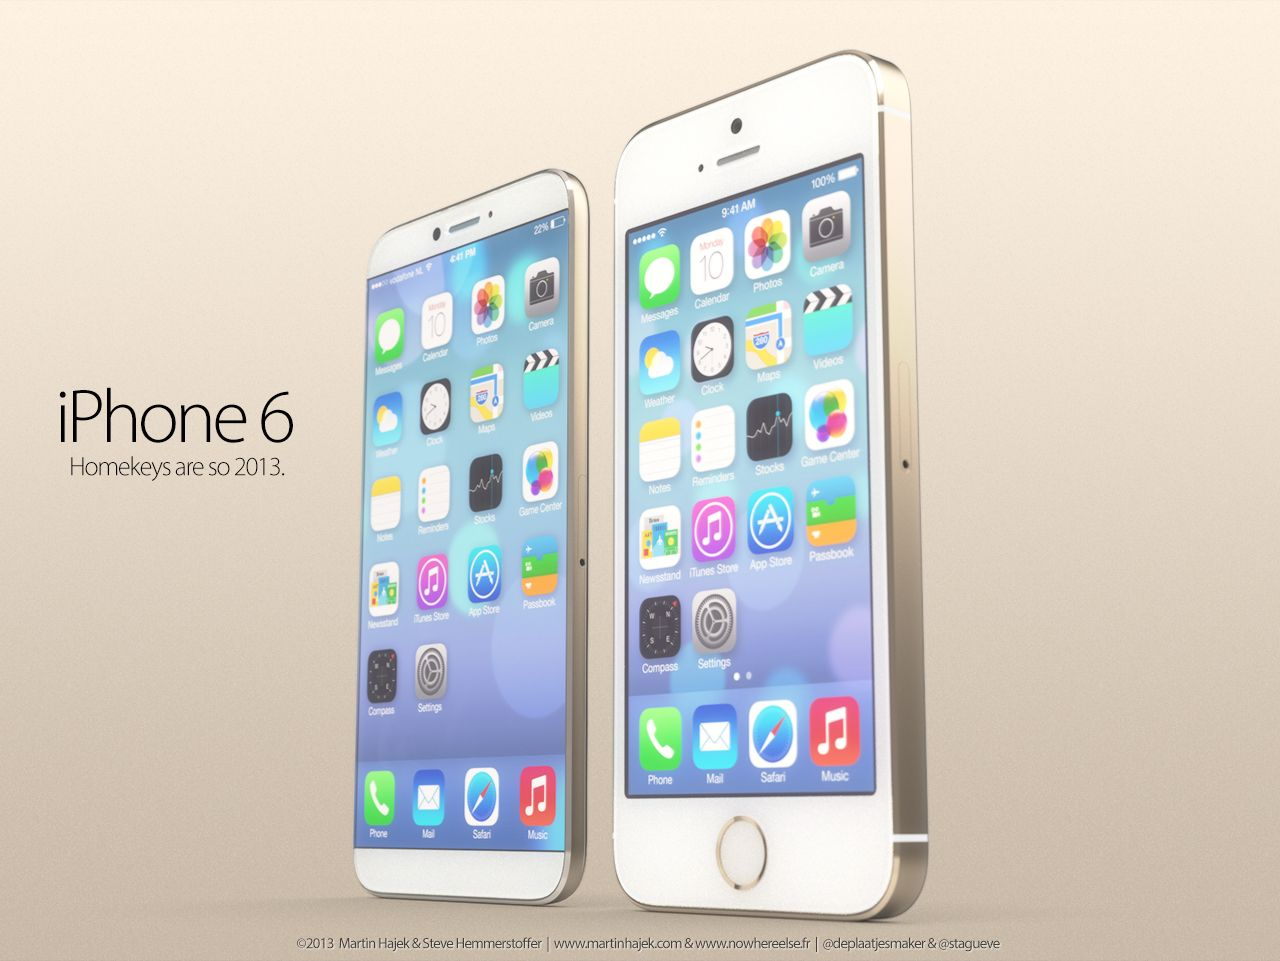 iPhone 6: ultimi rumors sulla scheda tecnica